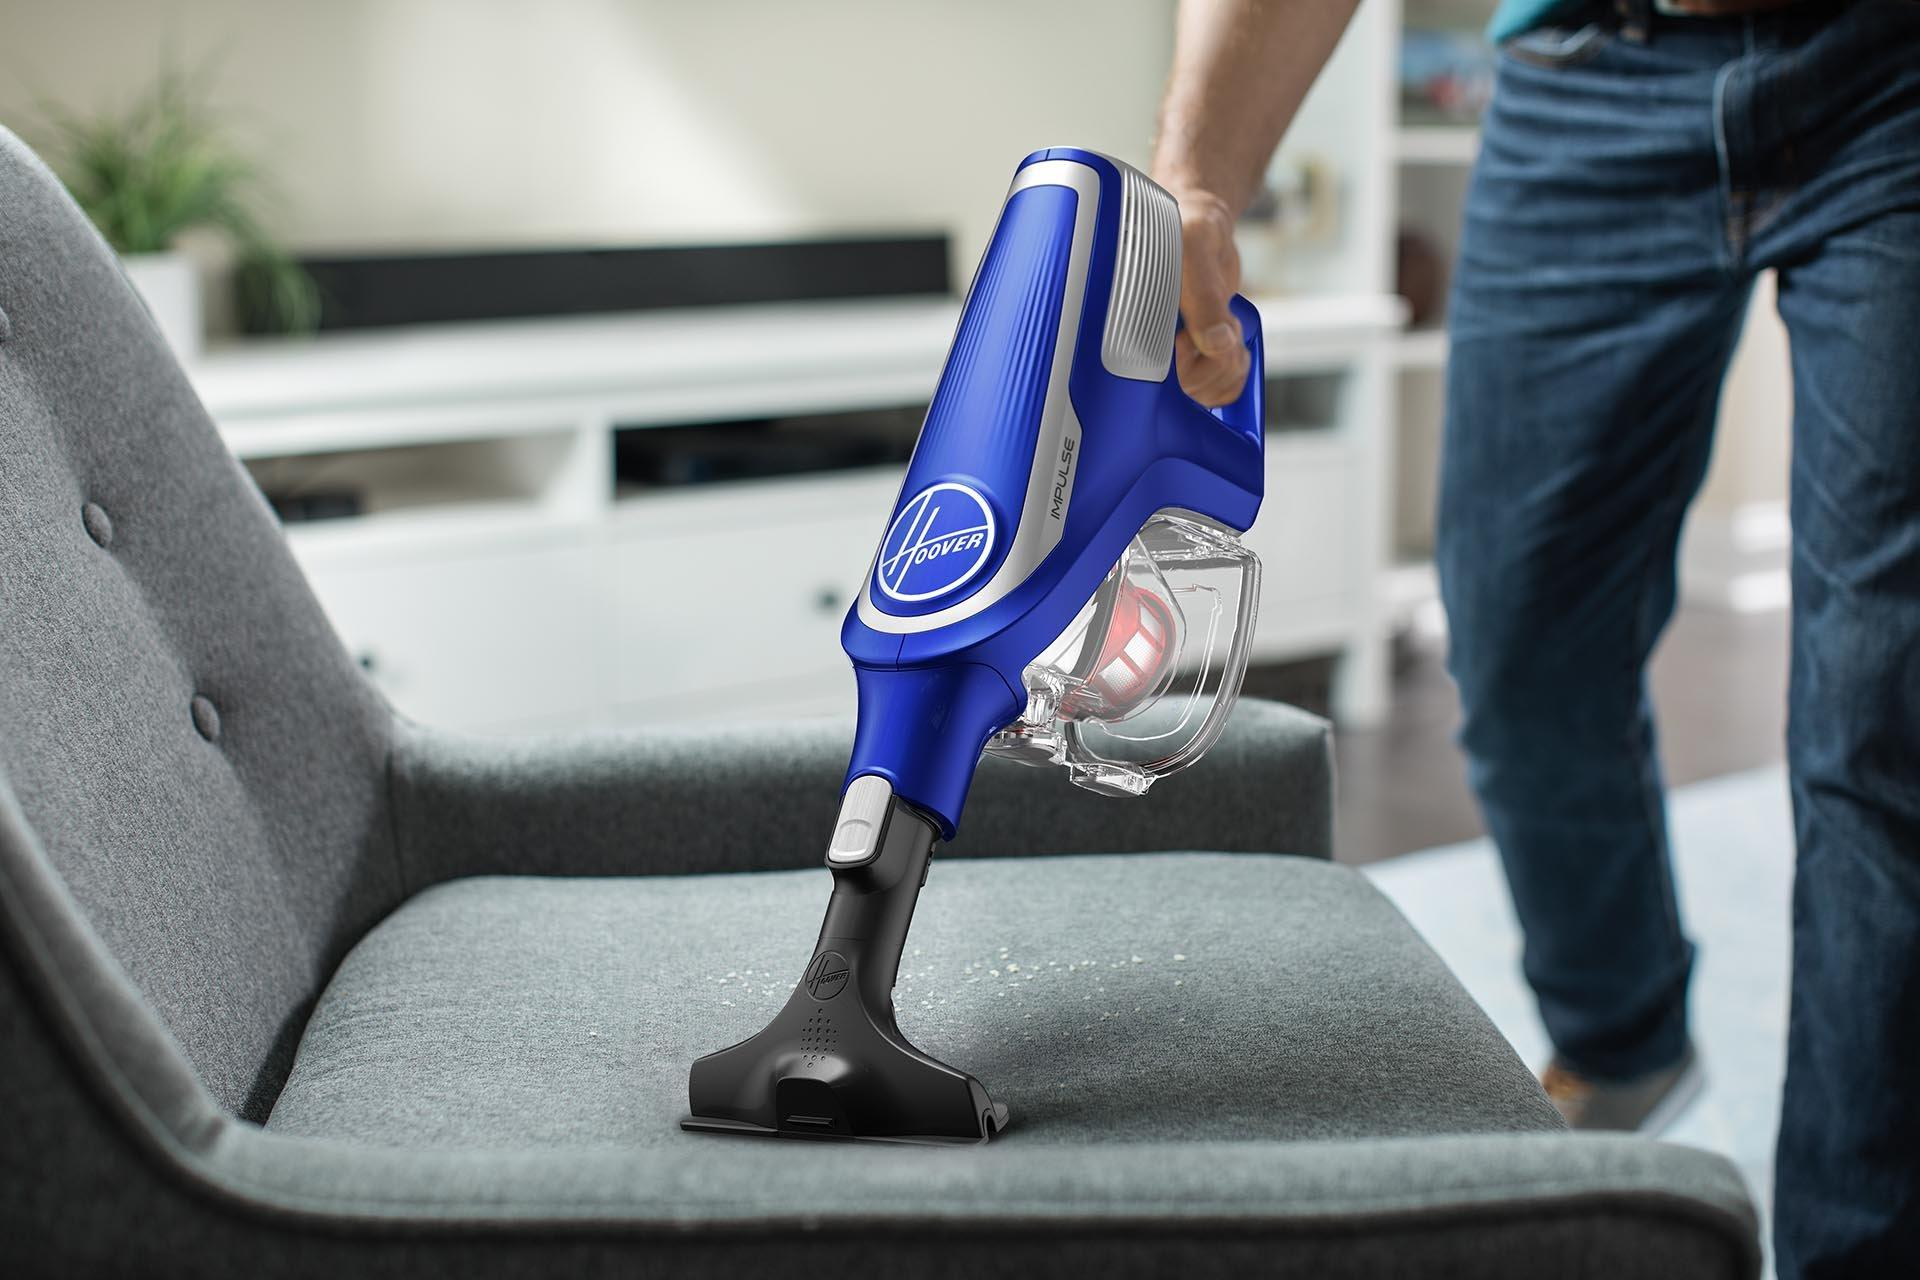 Hoover IMPULSE Cordless Vacuum6